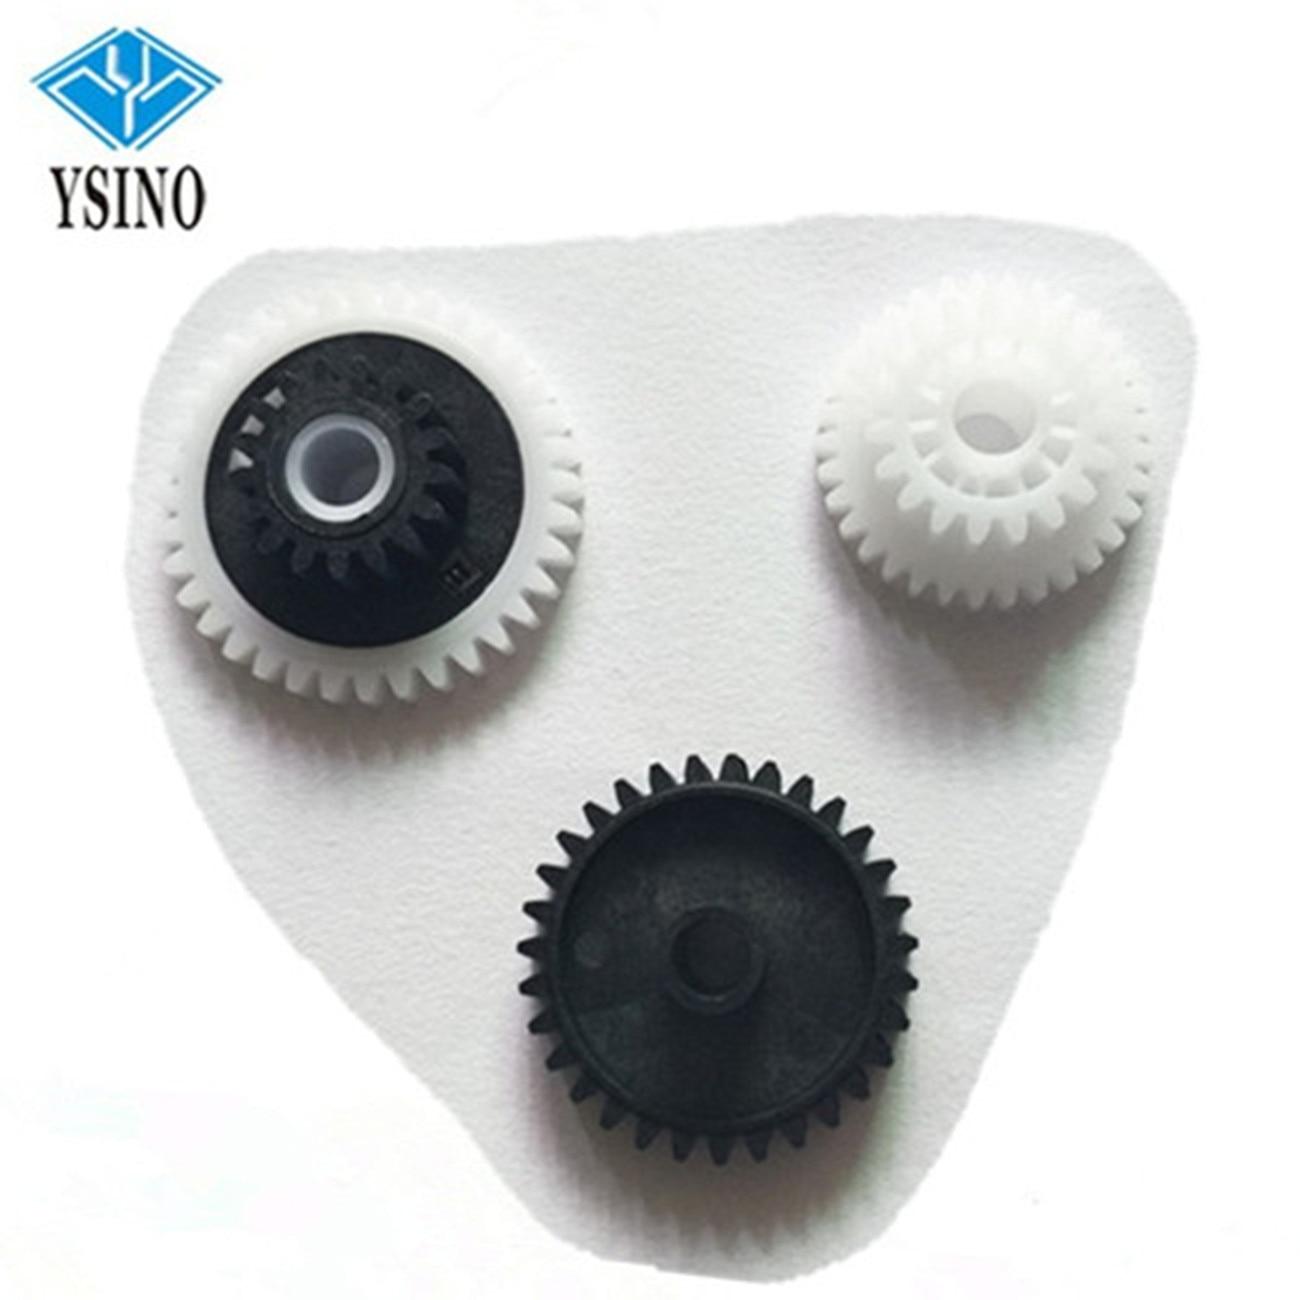 5Sets X Factory Grade A Quality Swing Gears Ru5-0628 Ru5-0637 Ru5-0655 For HP M5025 M5035 5035 5025 HP5200